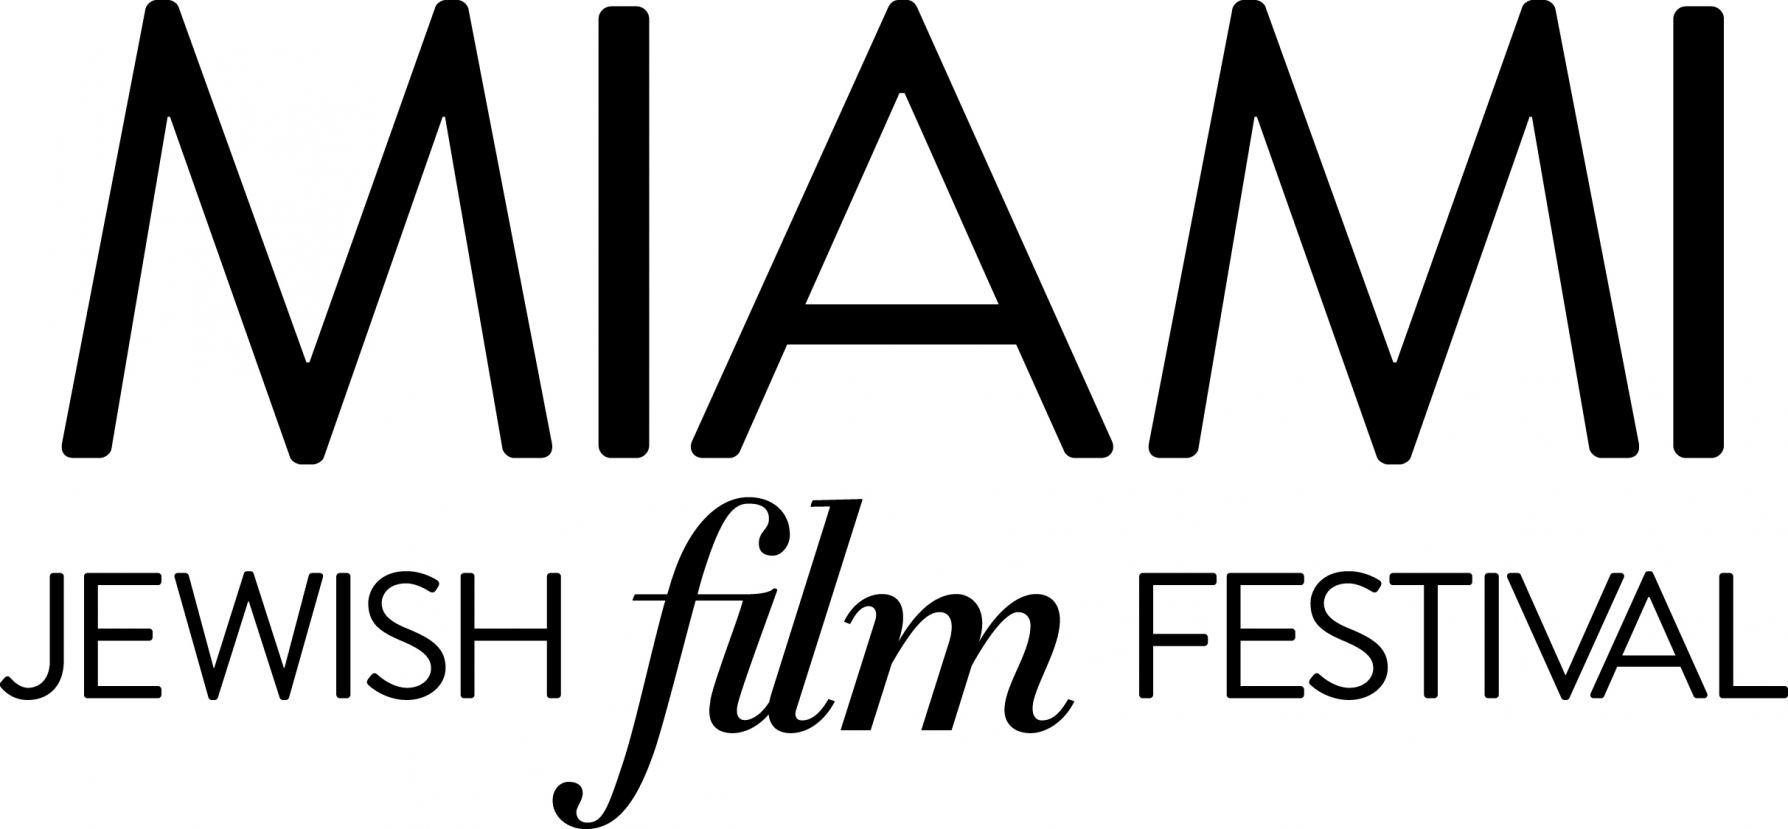 Miami Jewish Film Festival Logo